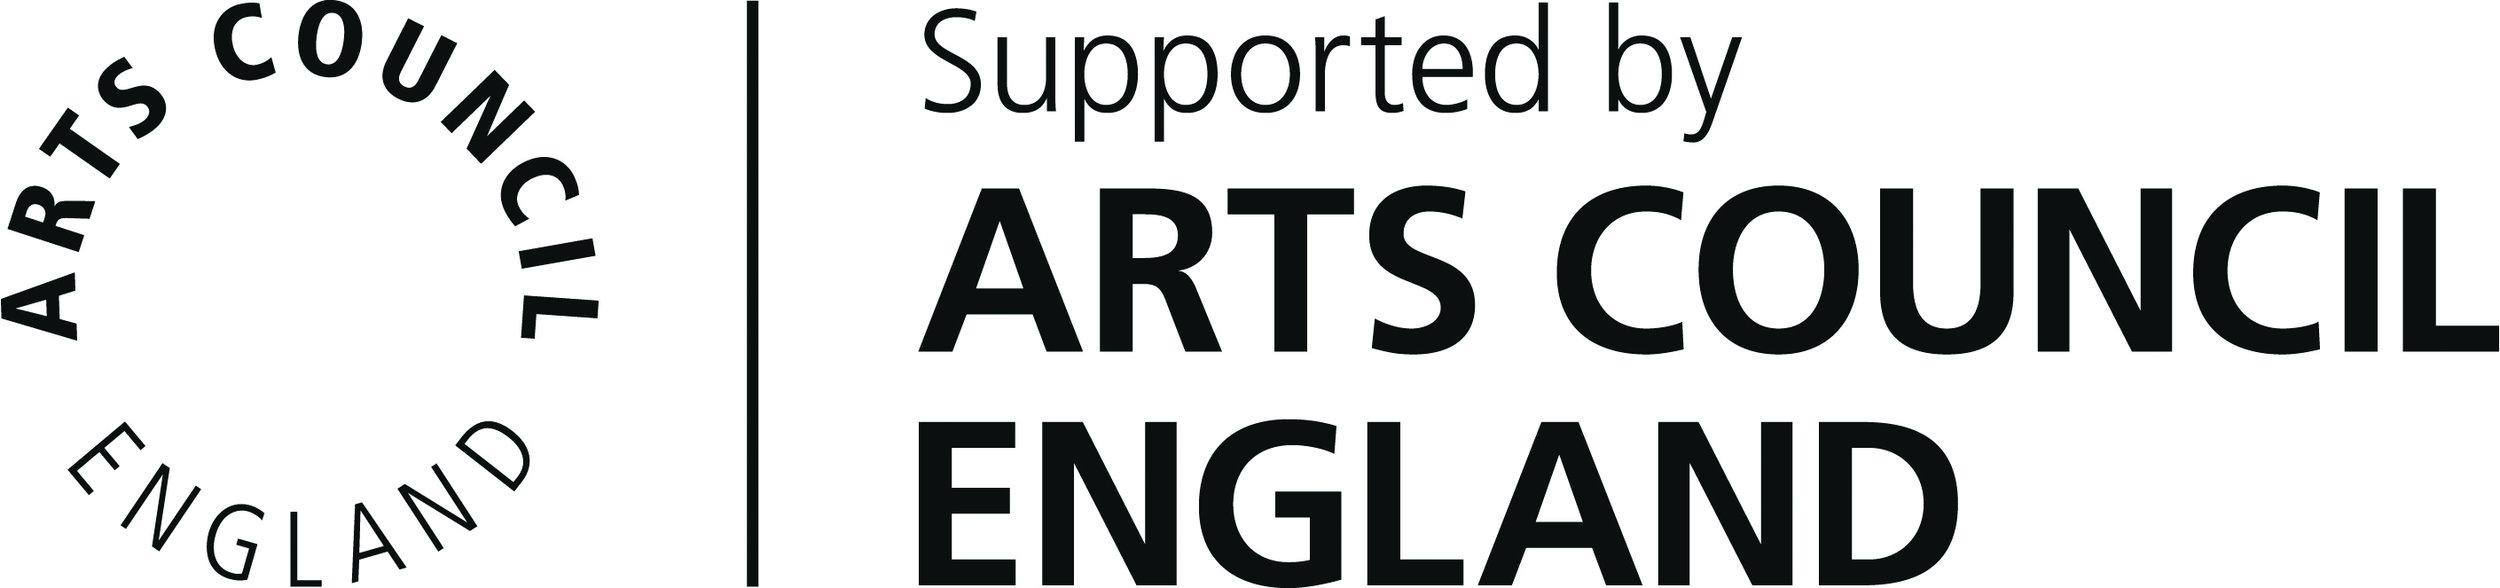 New_Arts_Council_grant_award_logo_hires.jpg